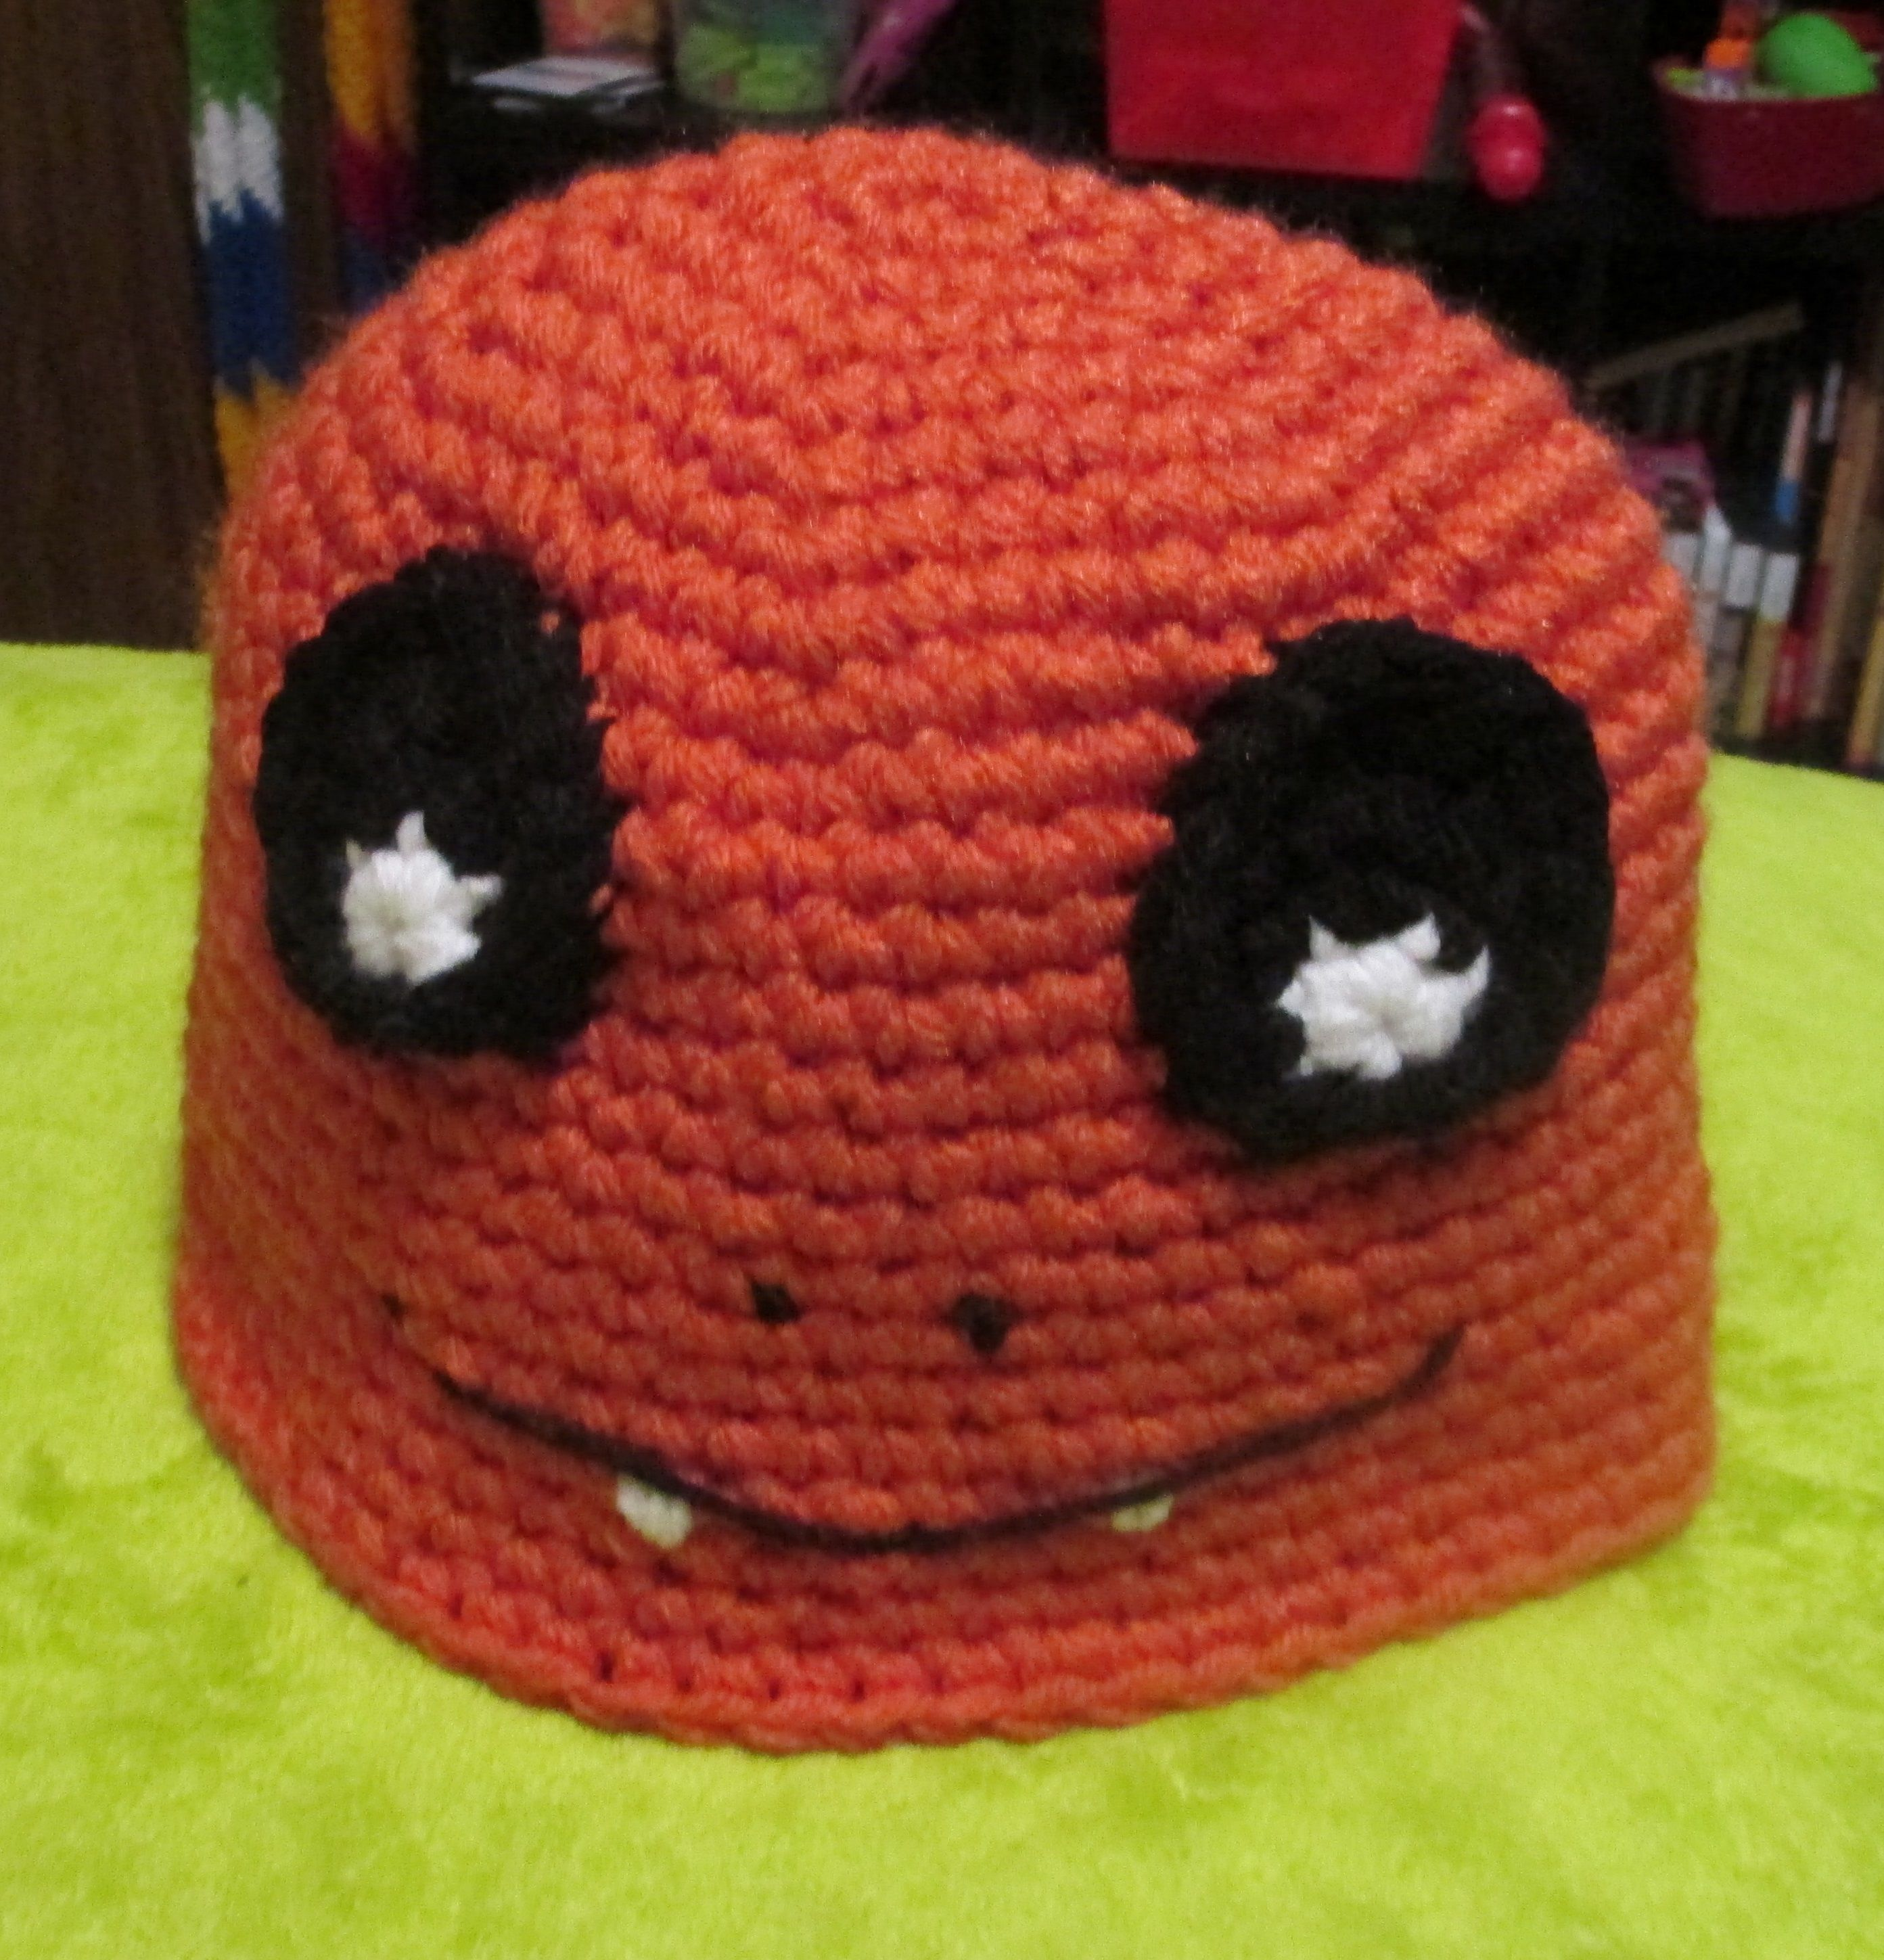 Charmander pokemon, crochet hat. | Crocheting | Pinterest | Gorro ...